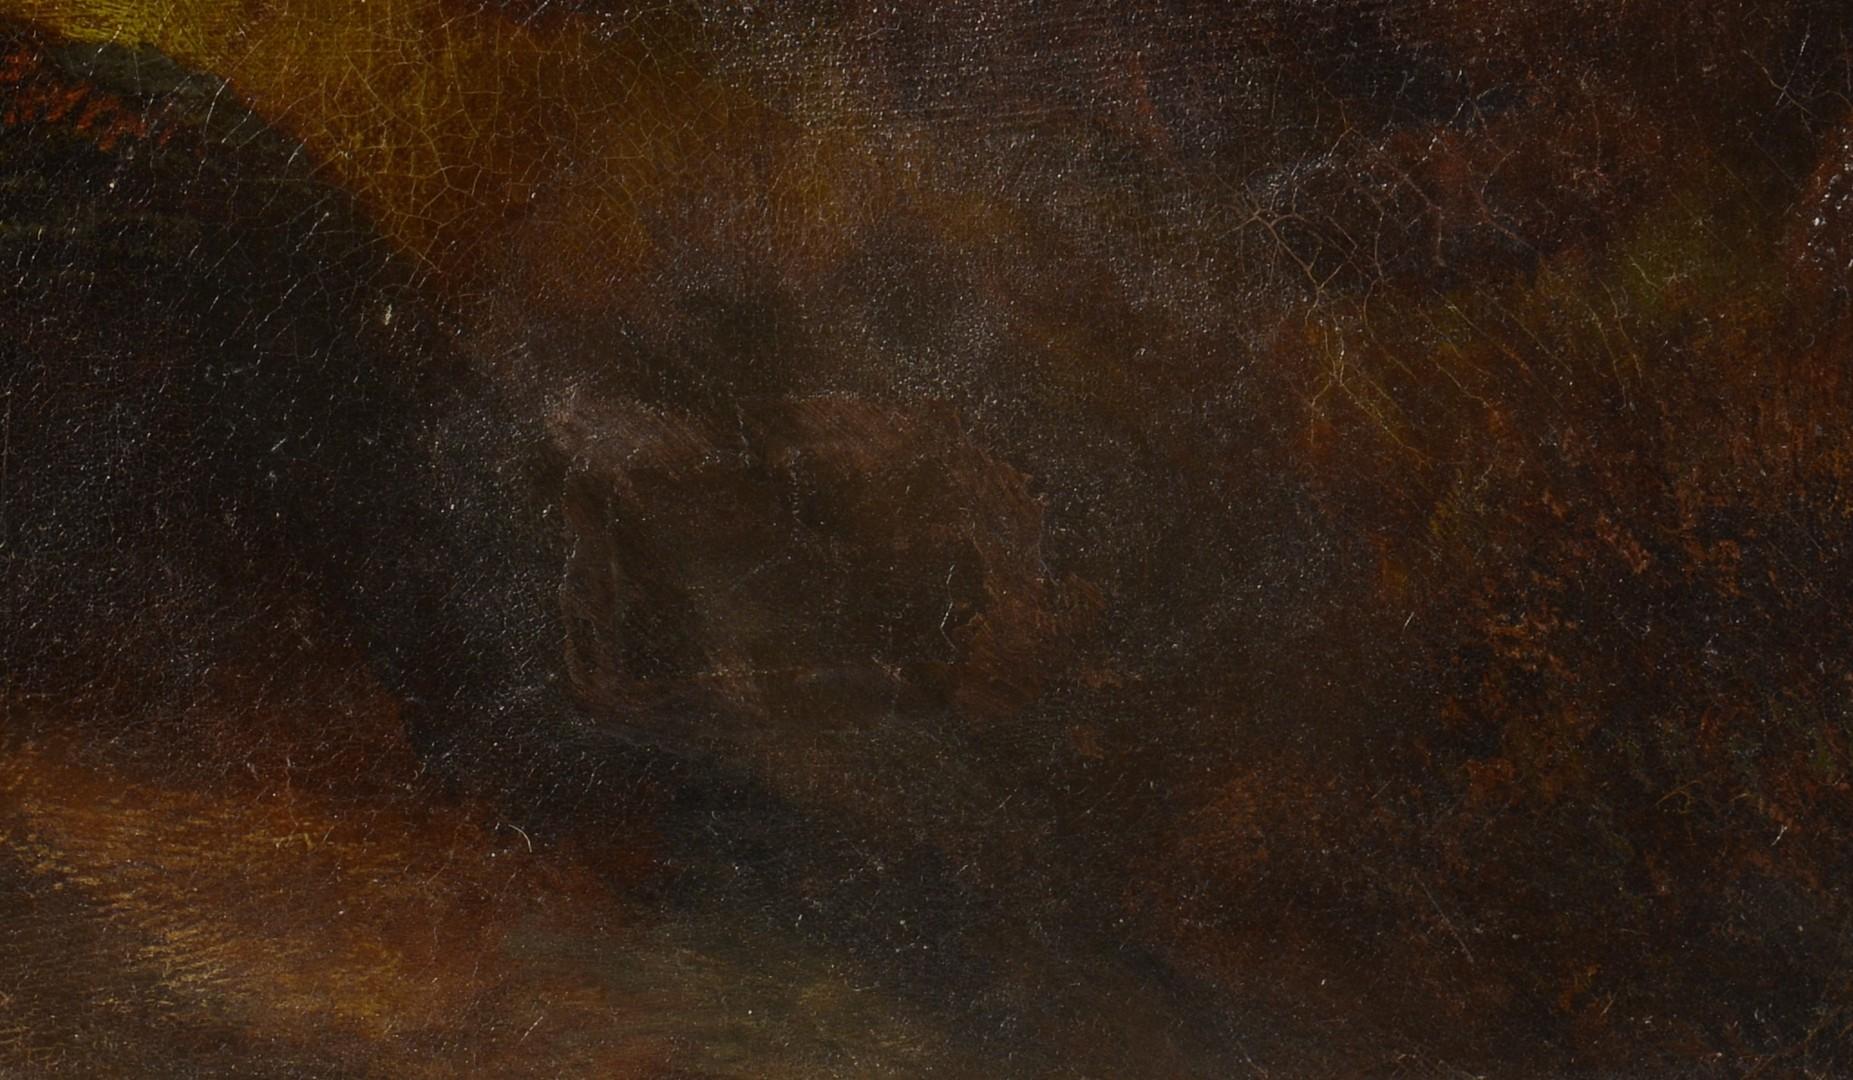 Lot 544: Scottish Oil on Canvas, signed J. S. Fox